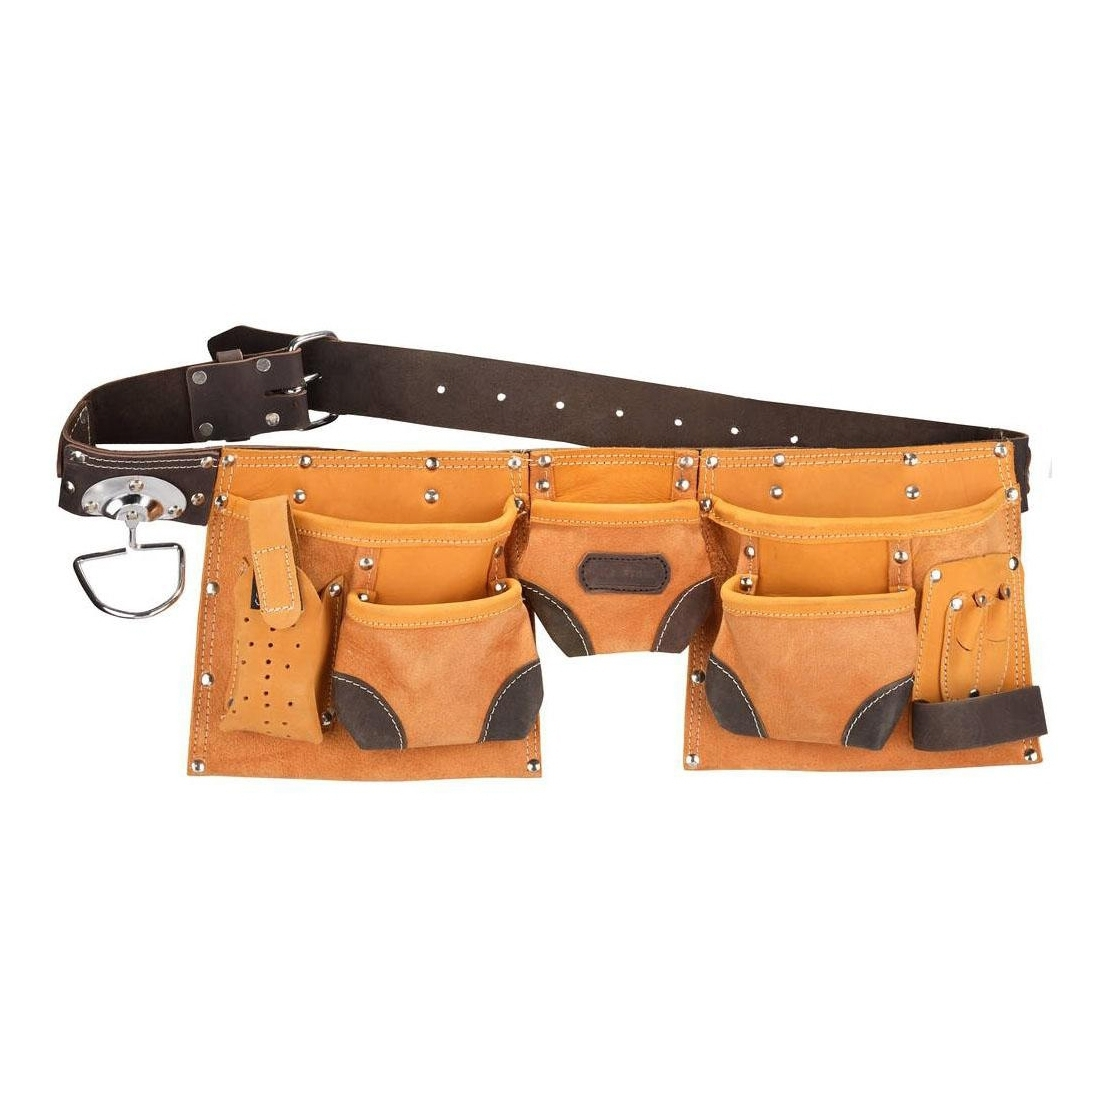 Фото - Bag belt tool KRAFTOOL 1-38520 cow leather tote bag brand 2018 bolsa feminina new women handbag 100% genuine leather alligator shoulder bag free shipping